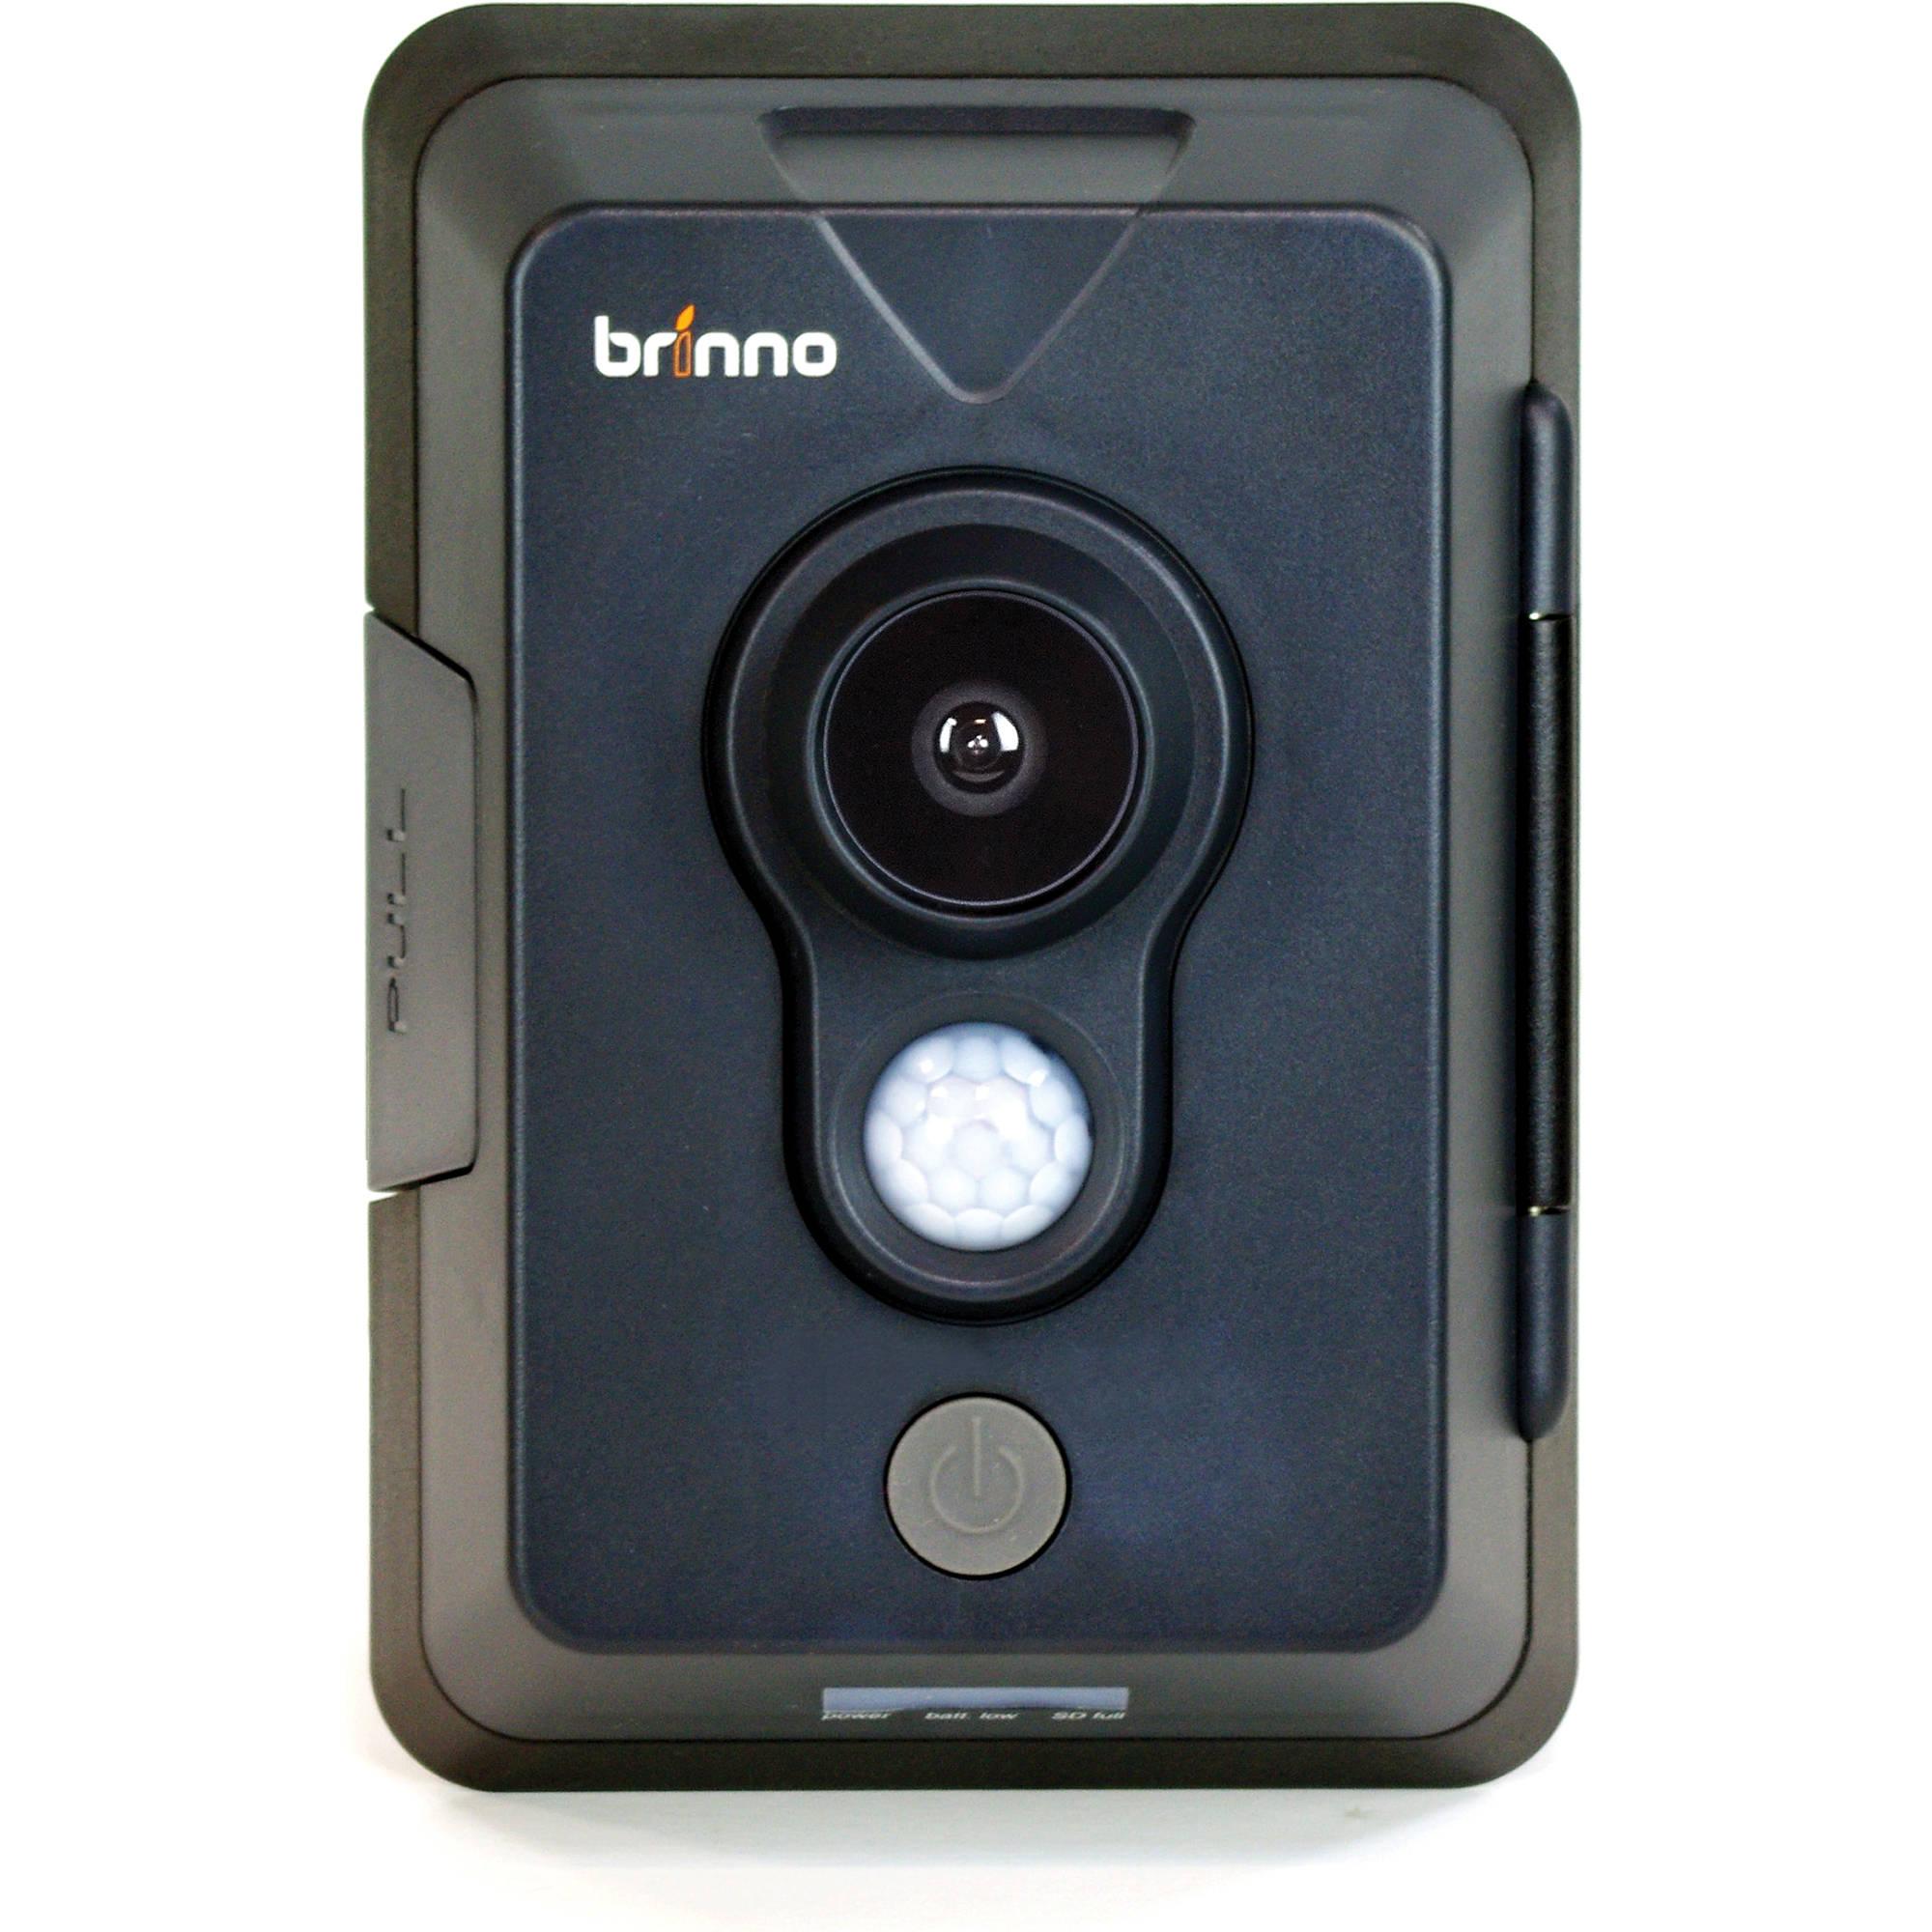 Brinno MAC100 Motion-Activated HomeWatchCam MAC100 B&H Photo